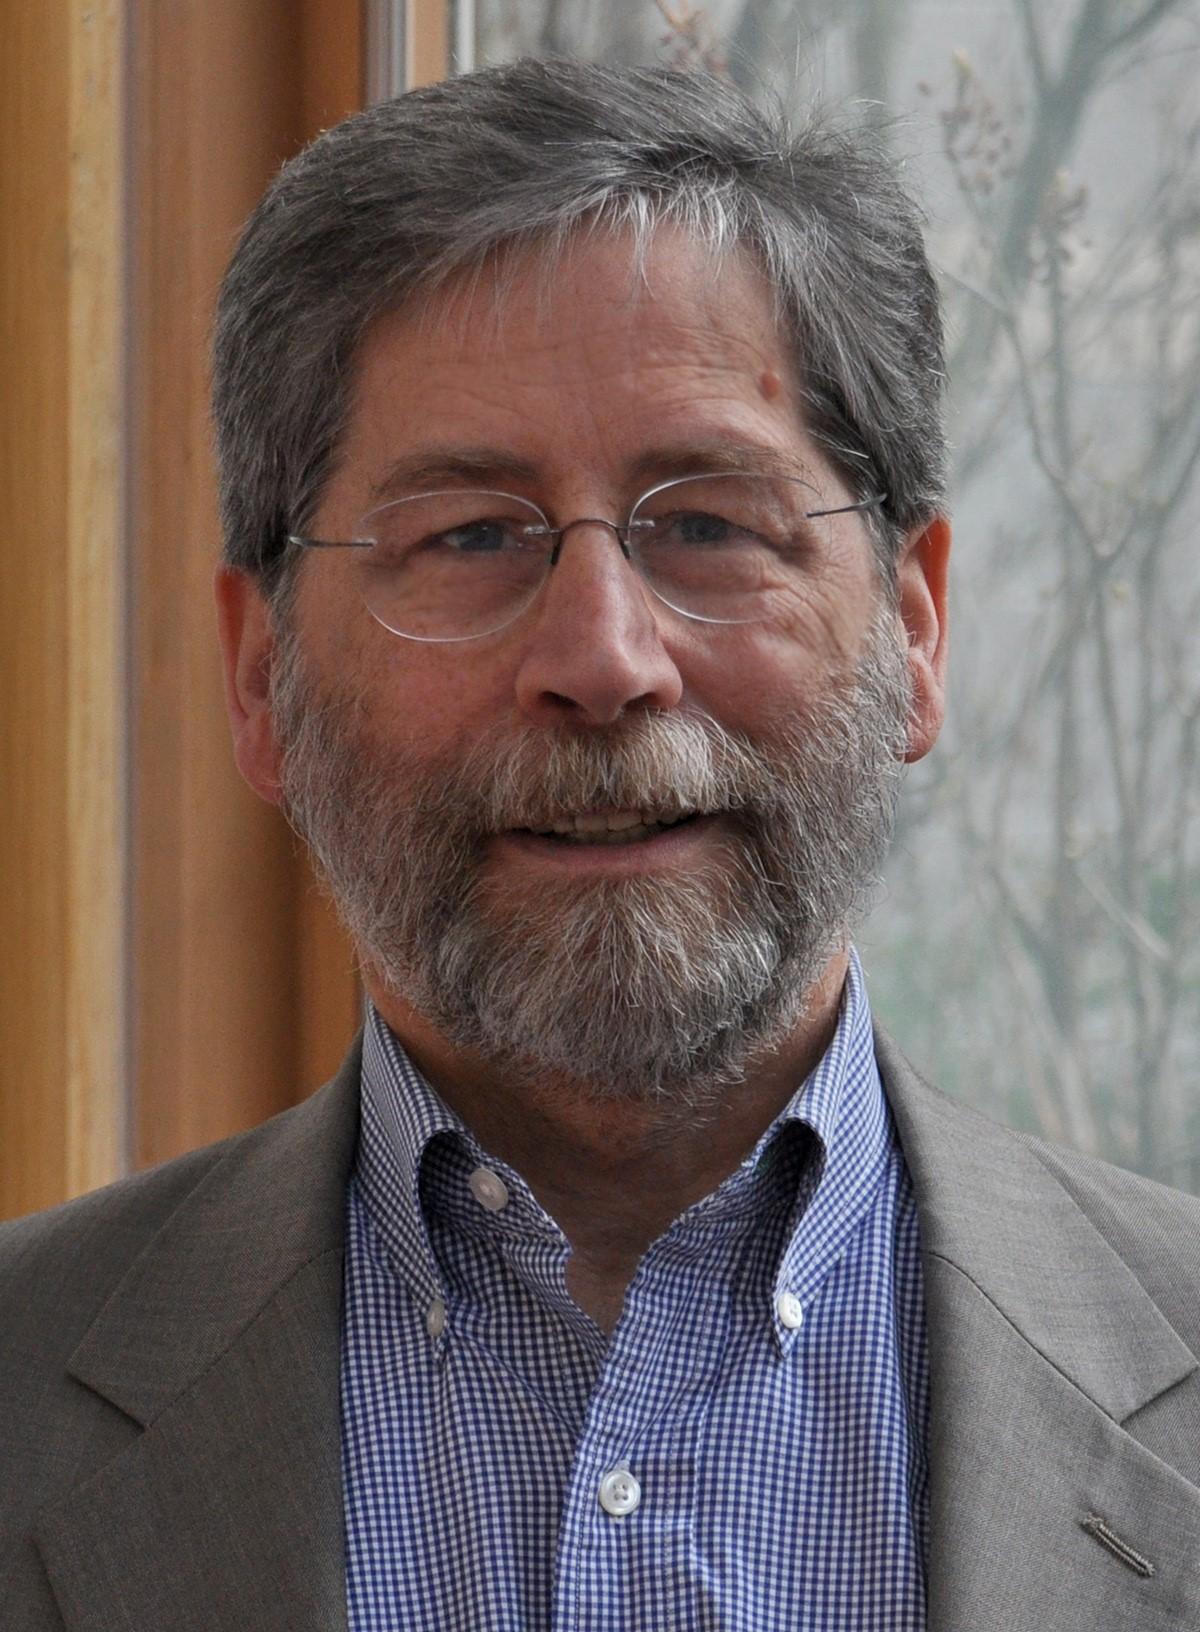 James Risser